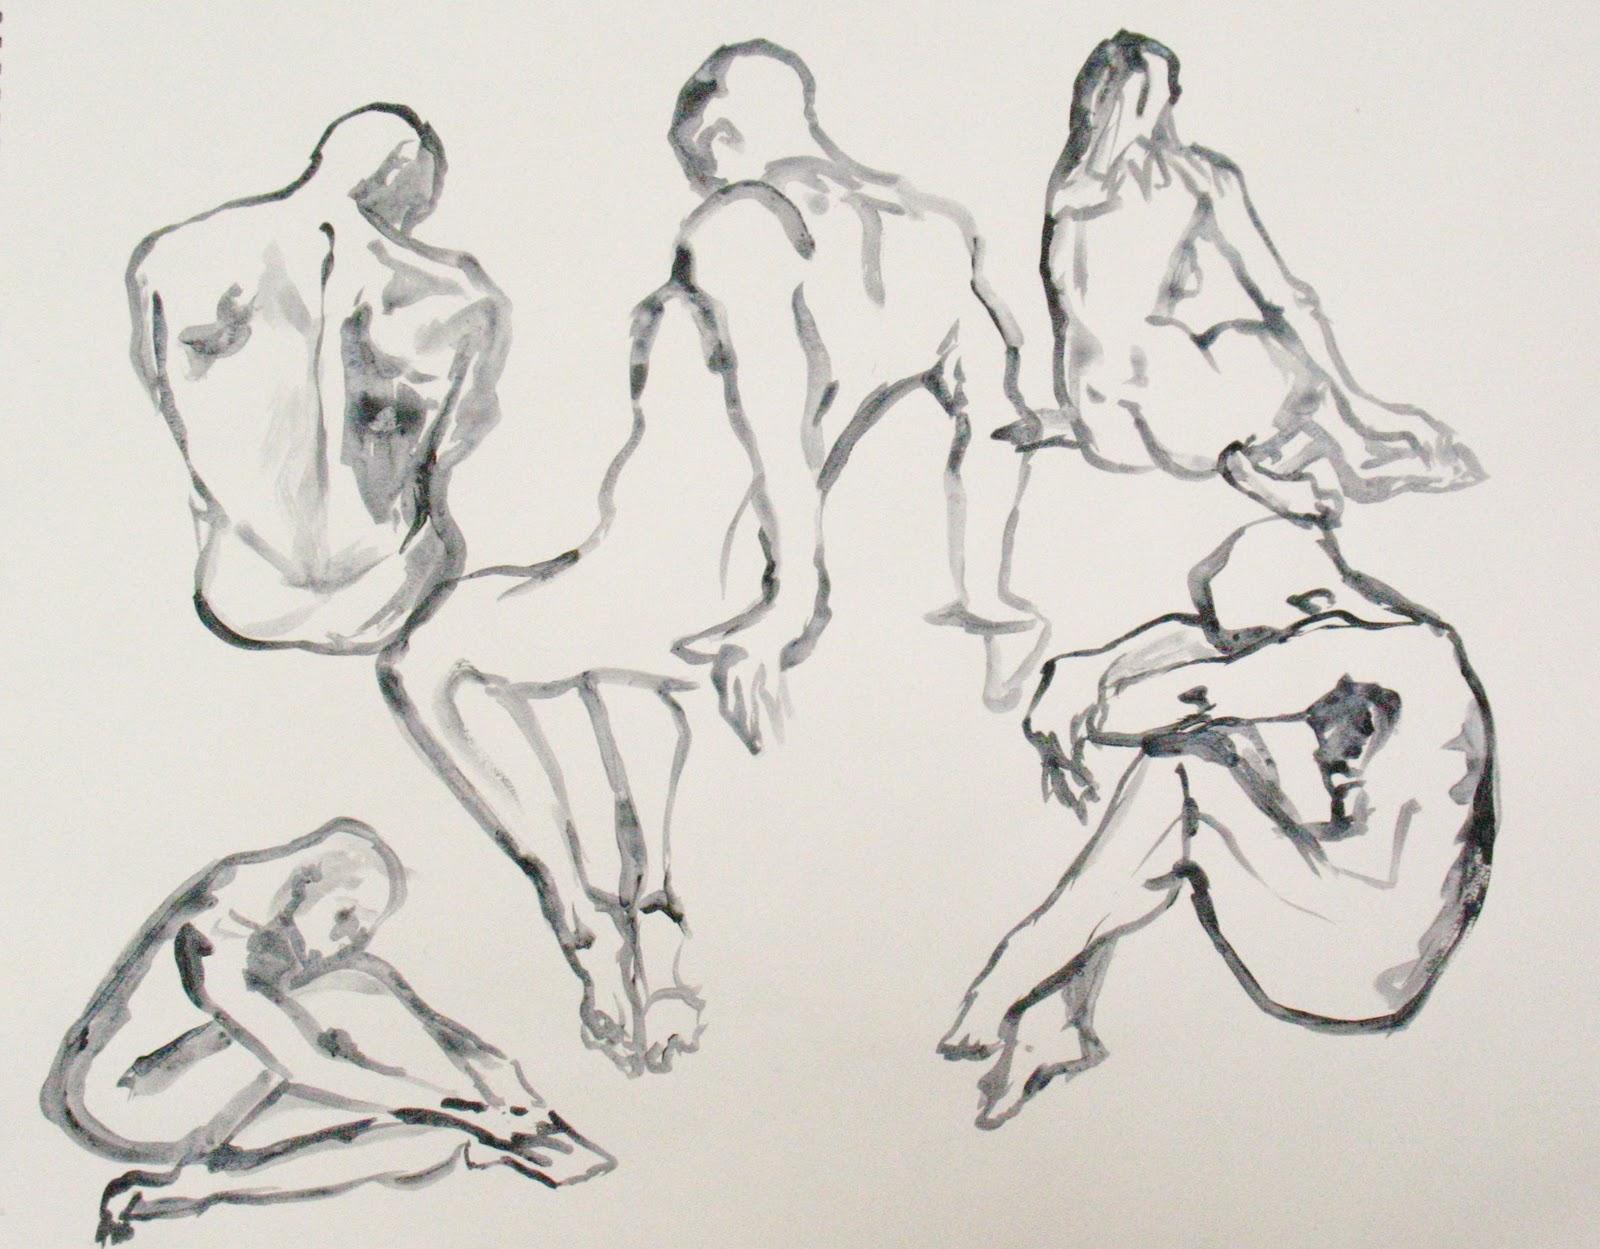 Shoebeast Illustration: Anatomy for the Artist